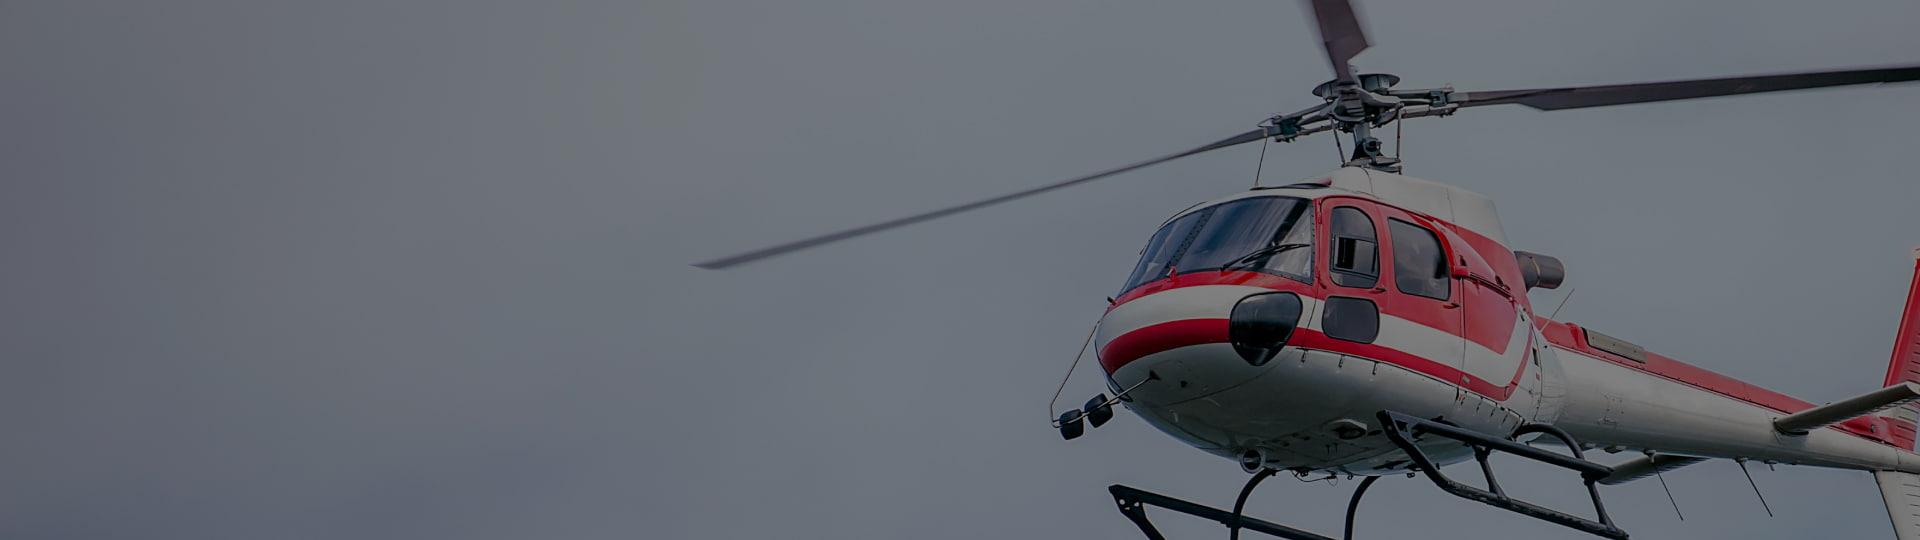 GPS трекер на вертолёт